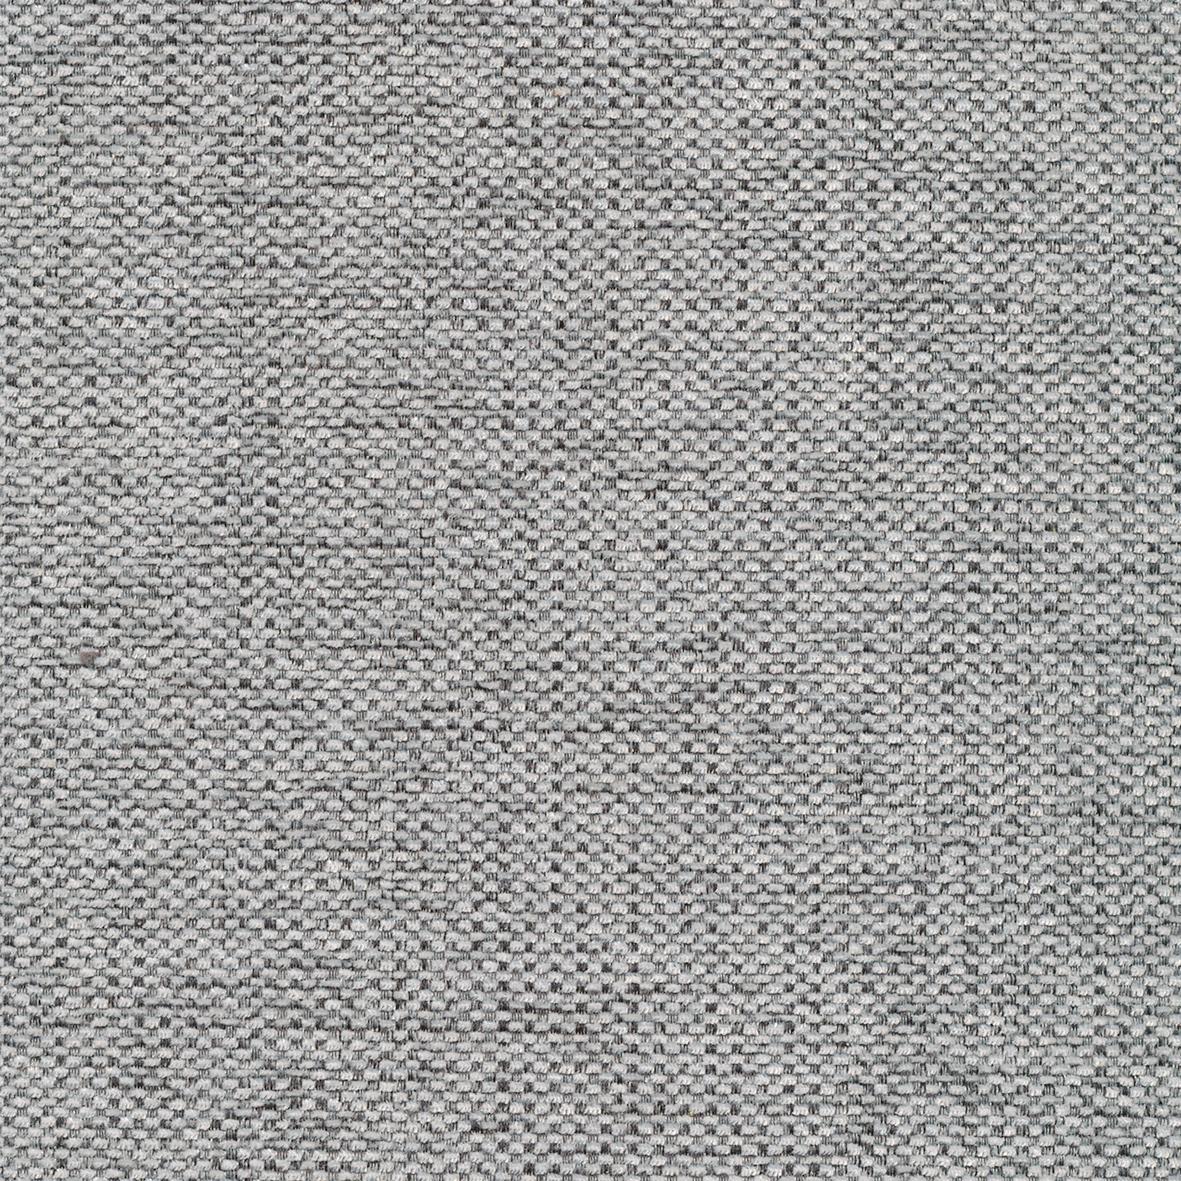 590-micro-check-greylowres_1